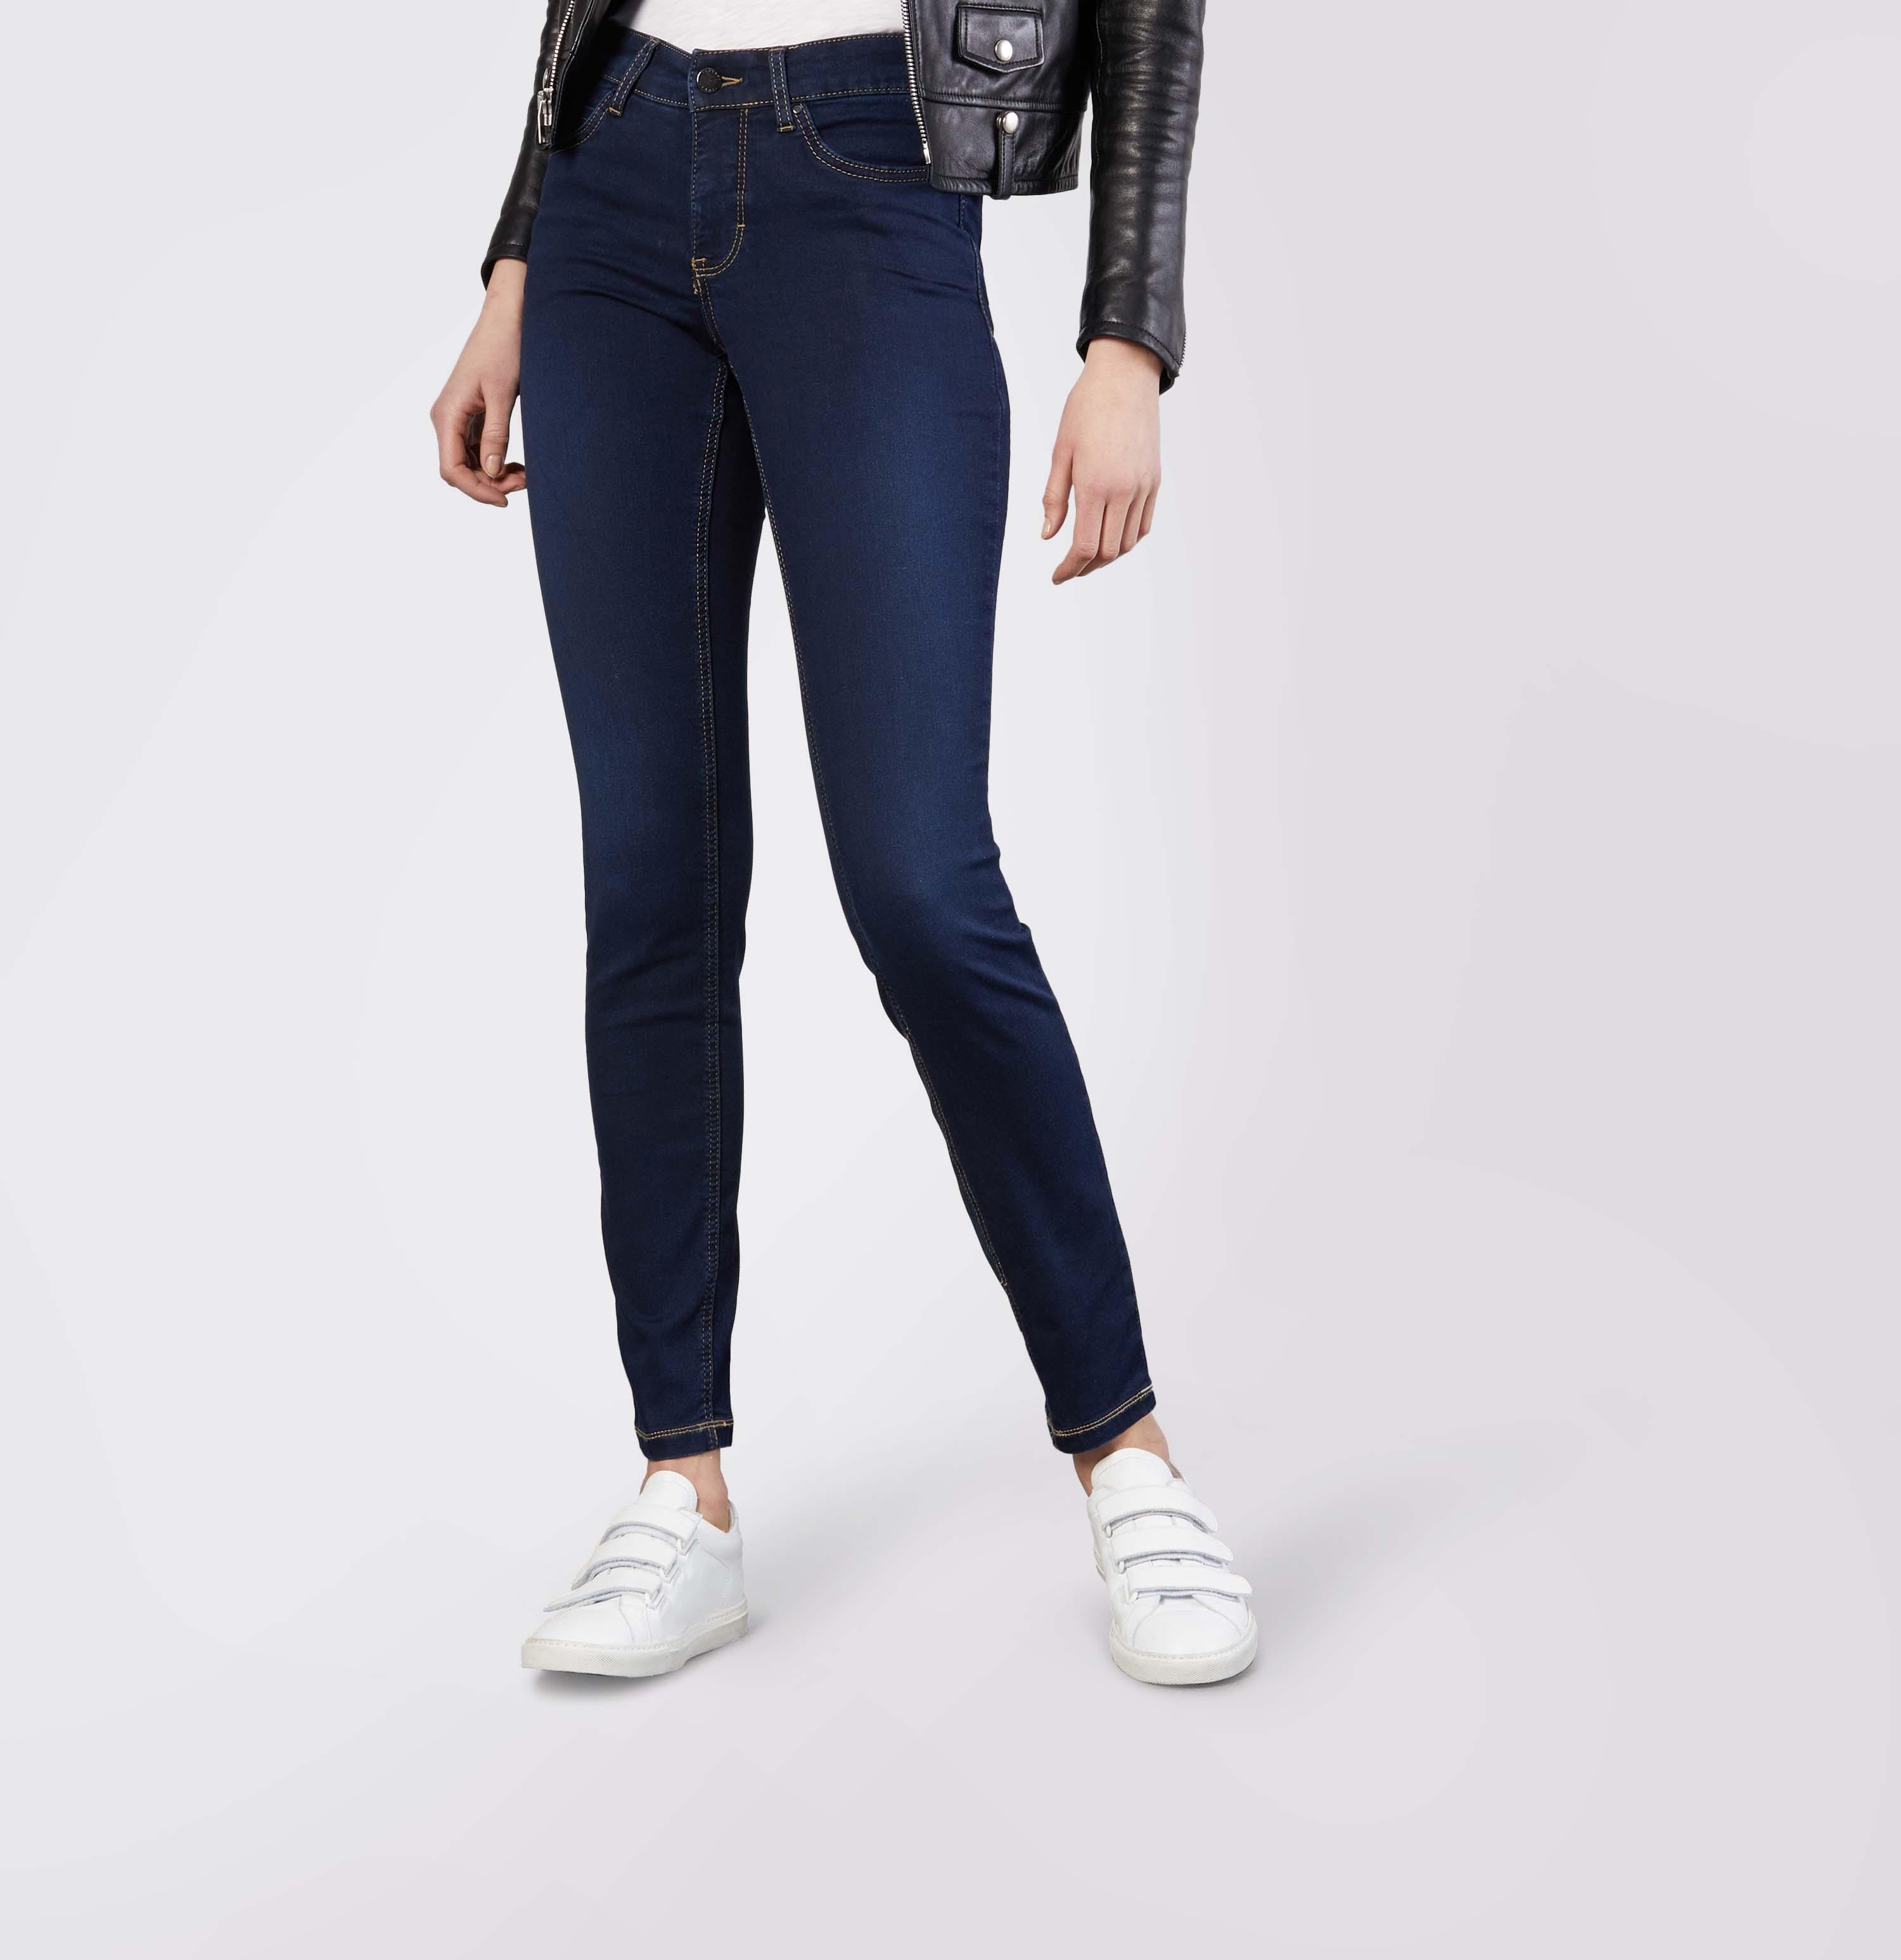 MAC Jeans Dream Skinny rinsed